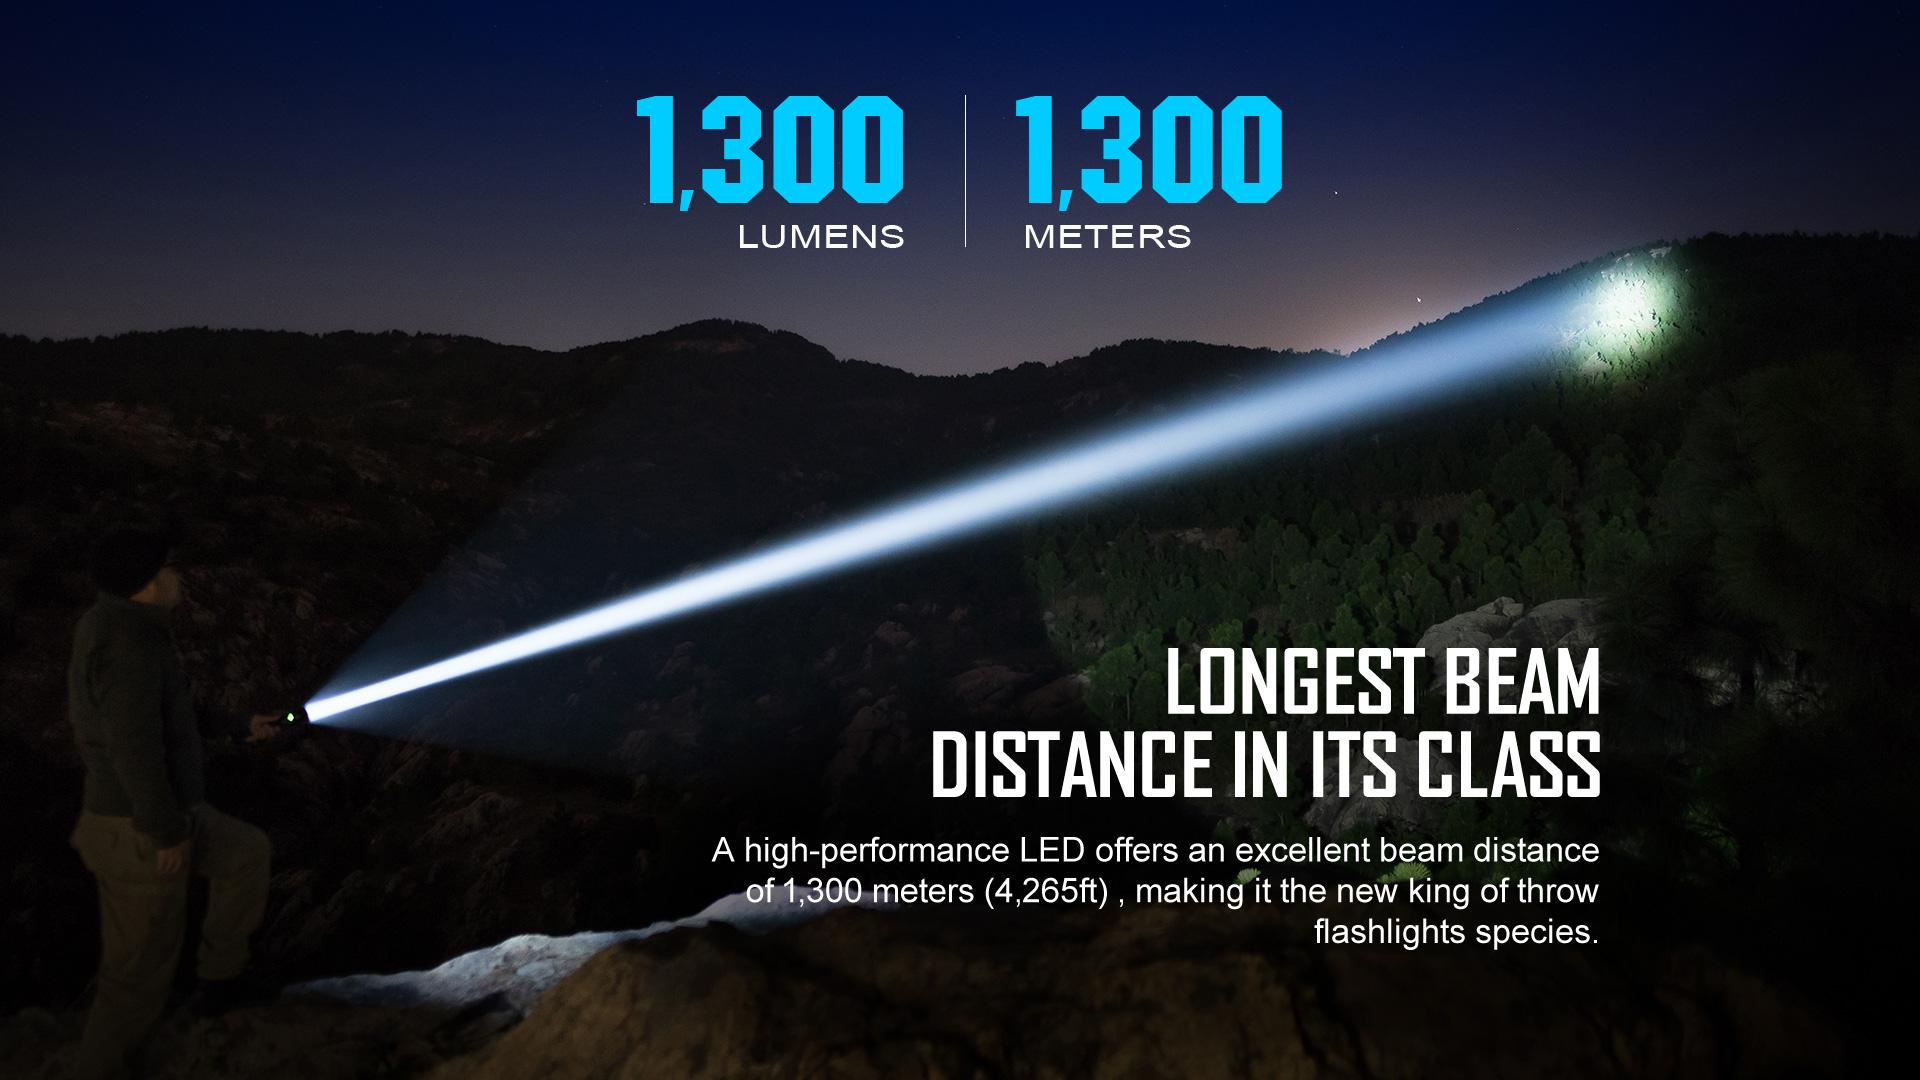 javelot turbo,1300 meters,hunting light,duty light